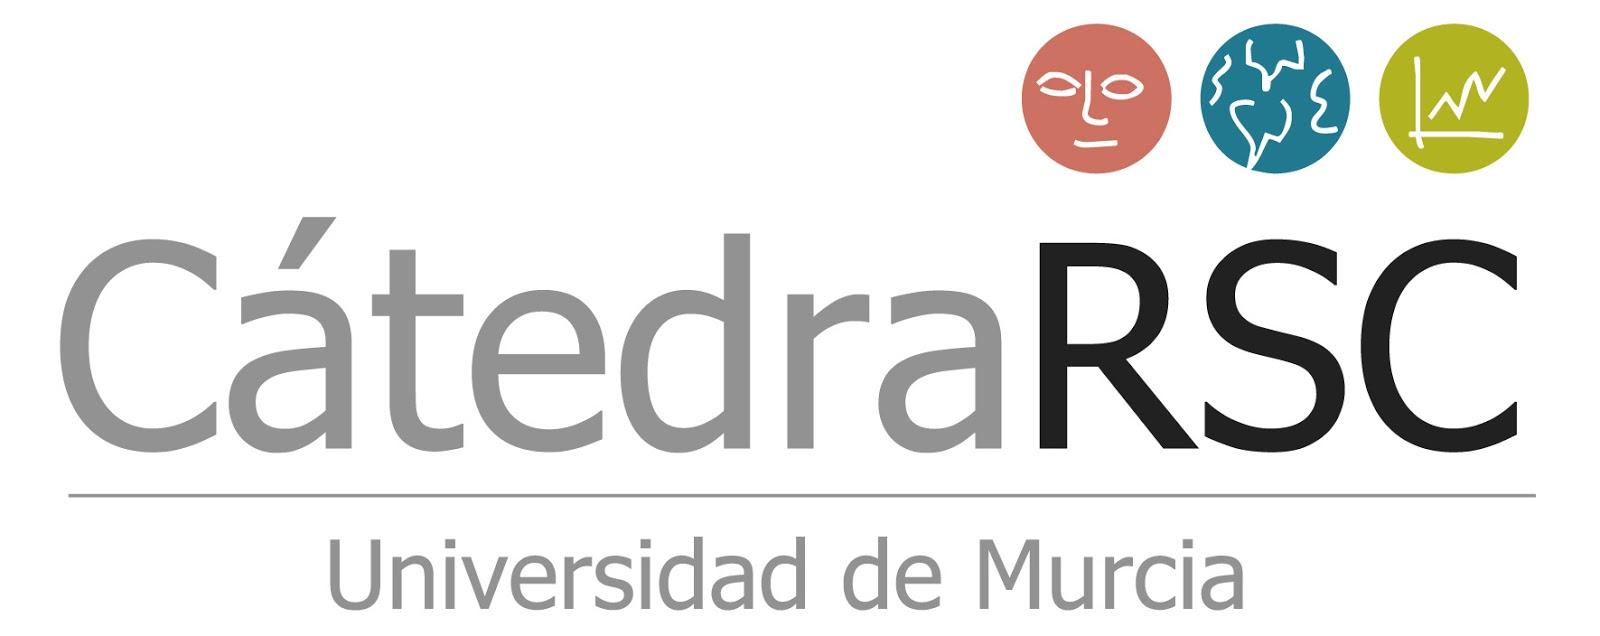 Convenio Prosur Cátedra RSC Universidad de Murcia